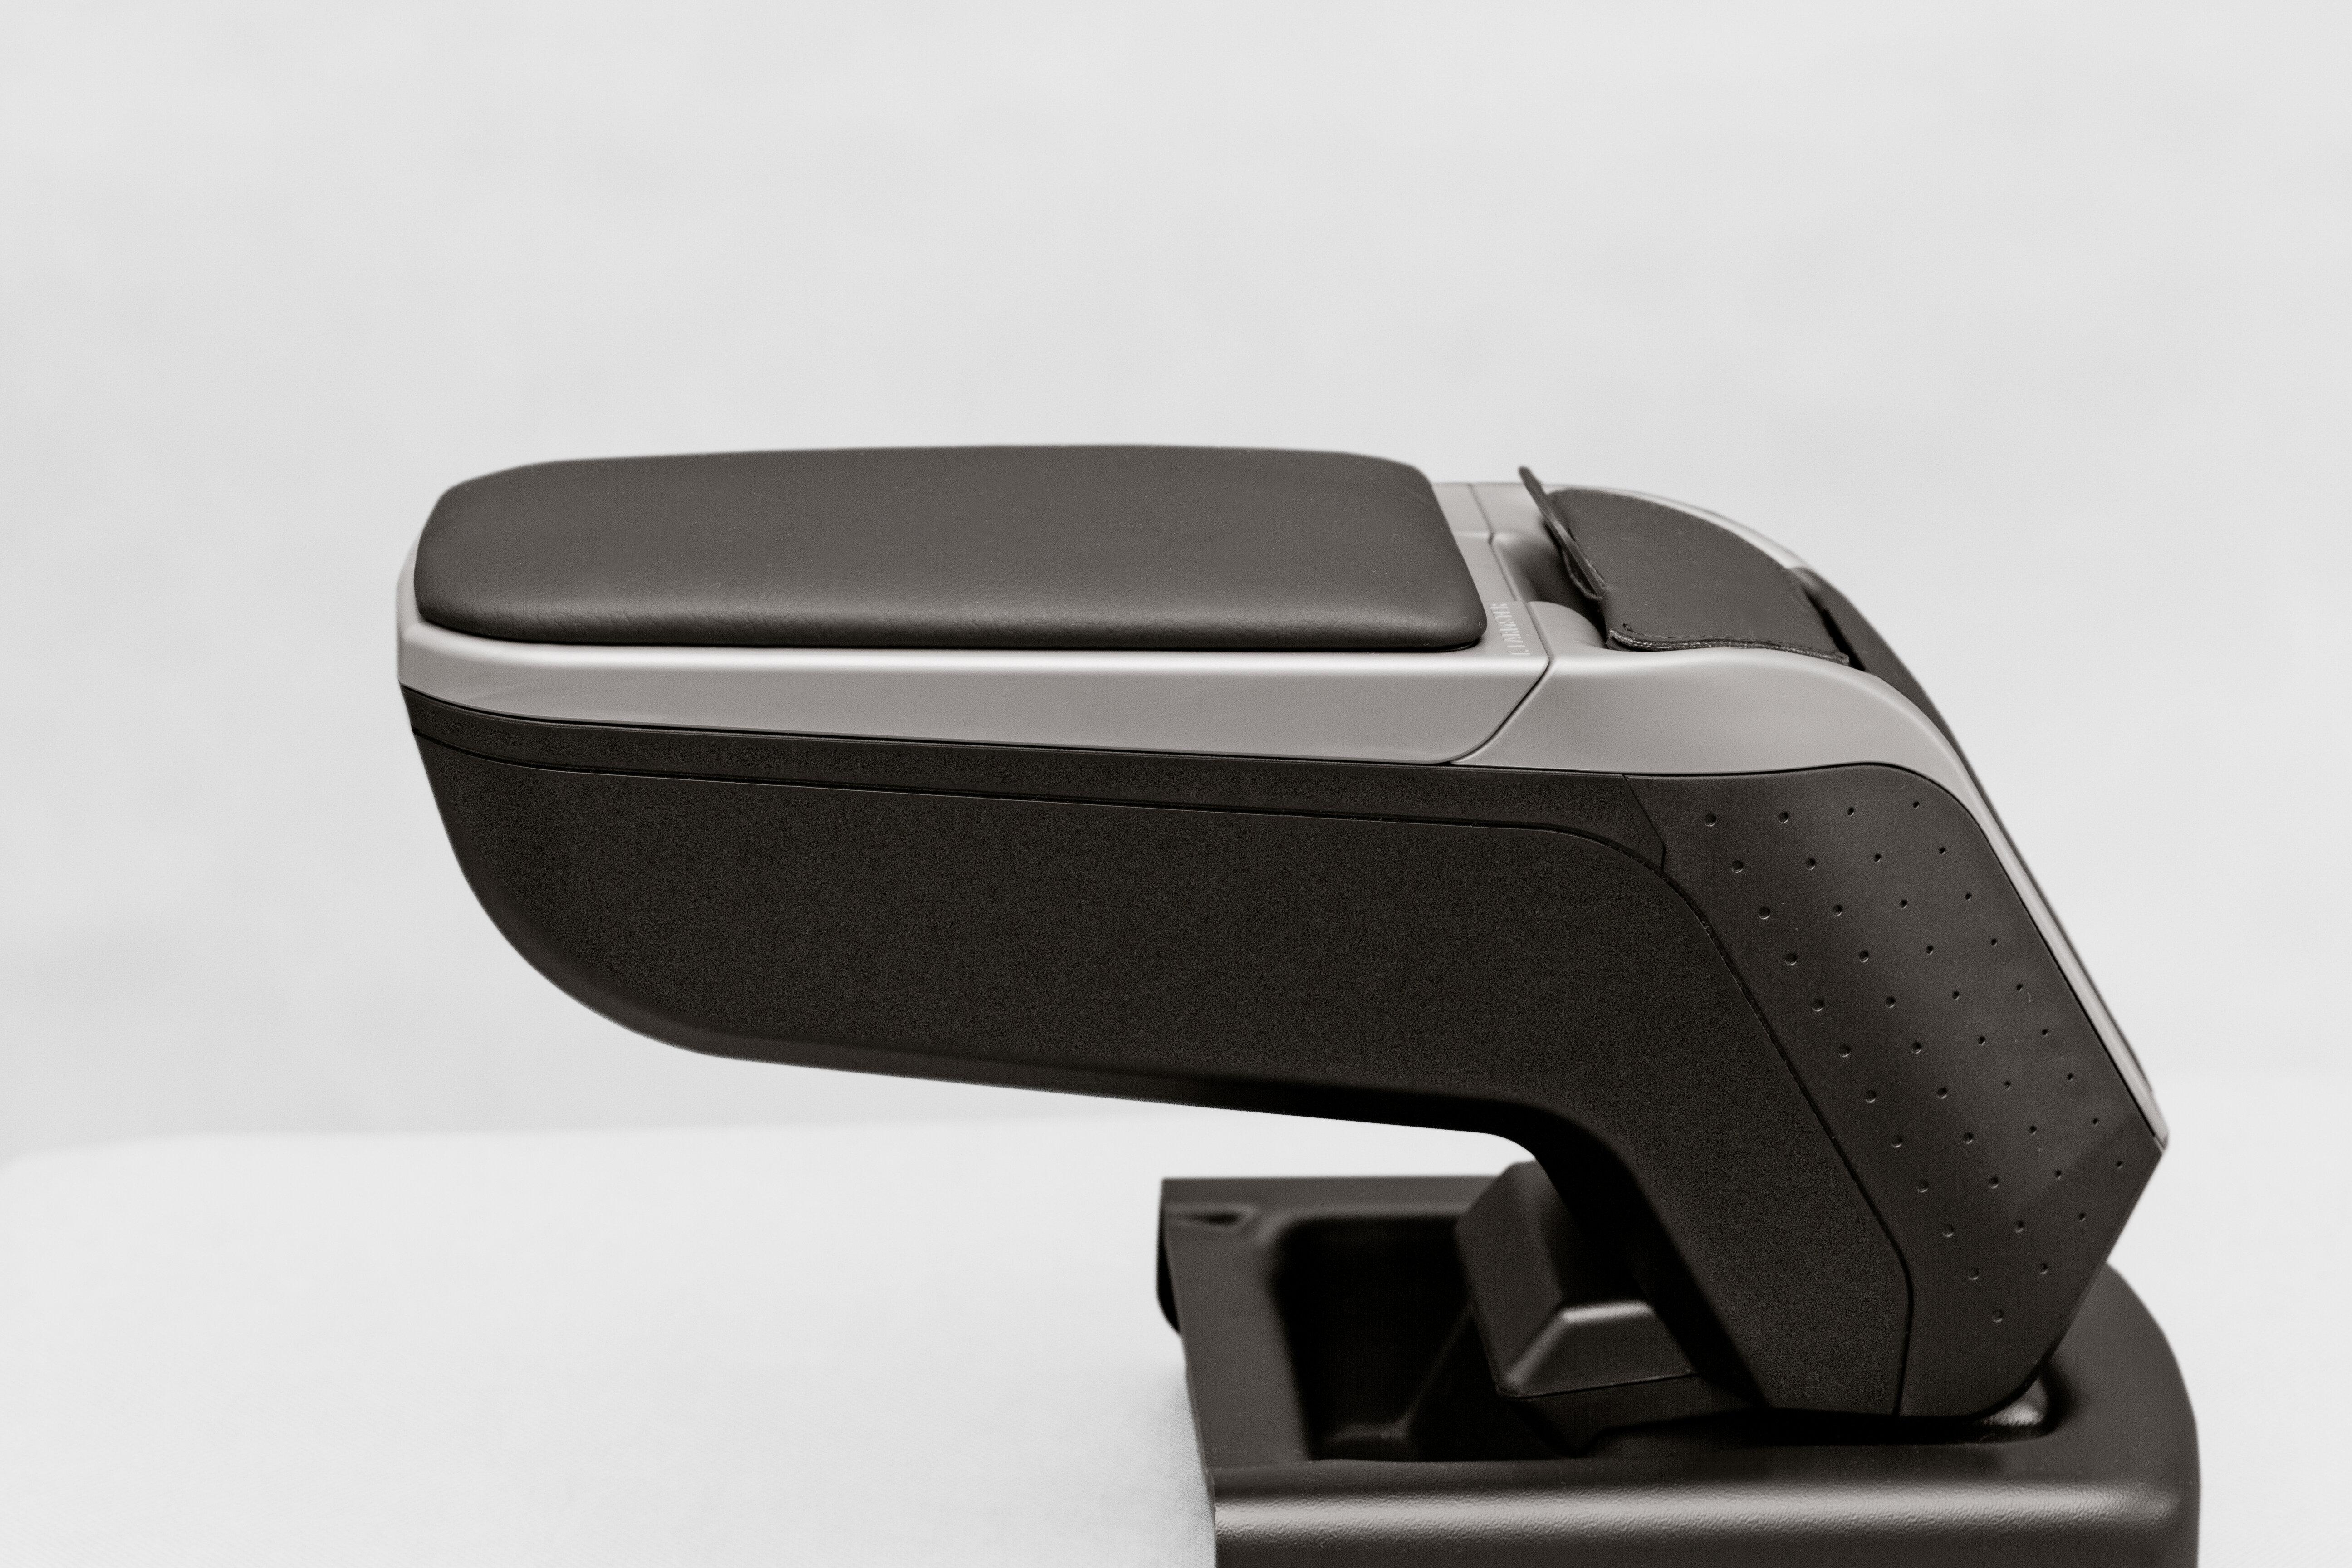 Подлокотник для Форд Фокус 3 ( Ford Focus 3 ) 2011-2014 года серый Armster V00396